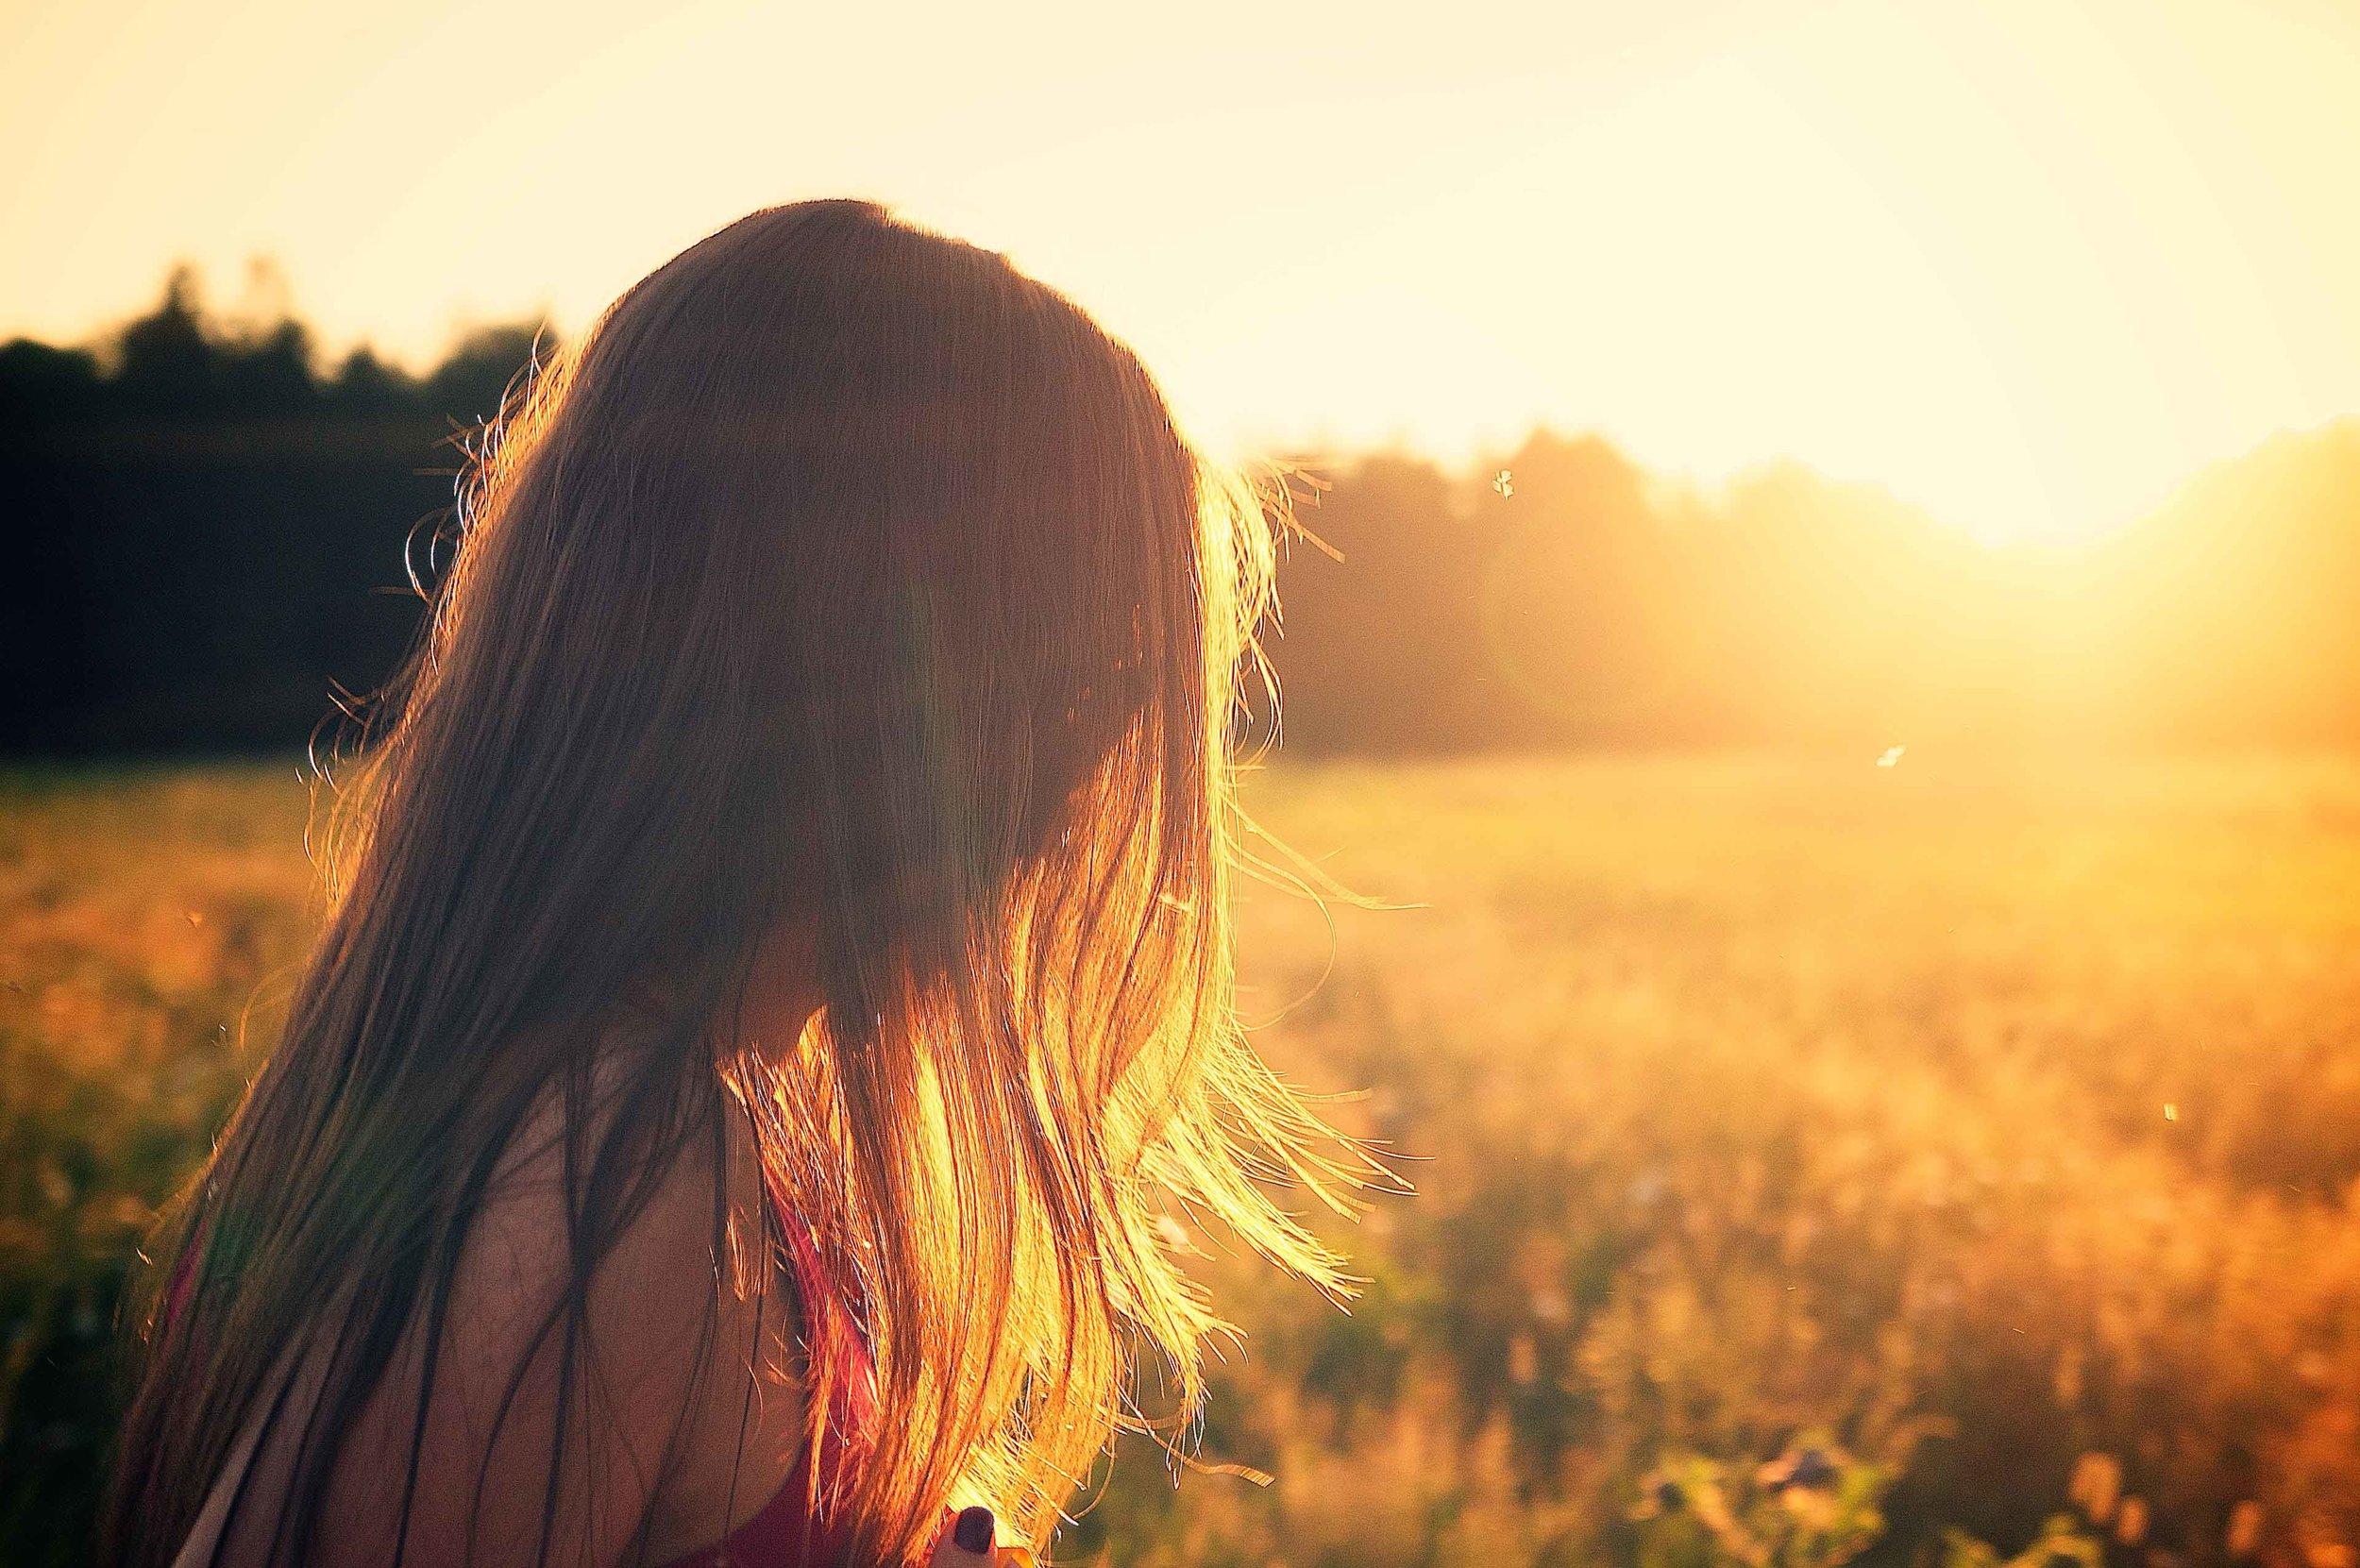 sunset-hairresized.jpg